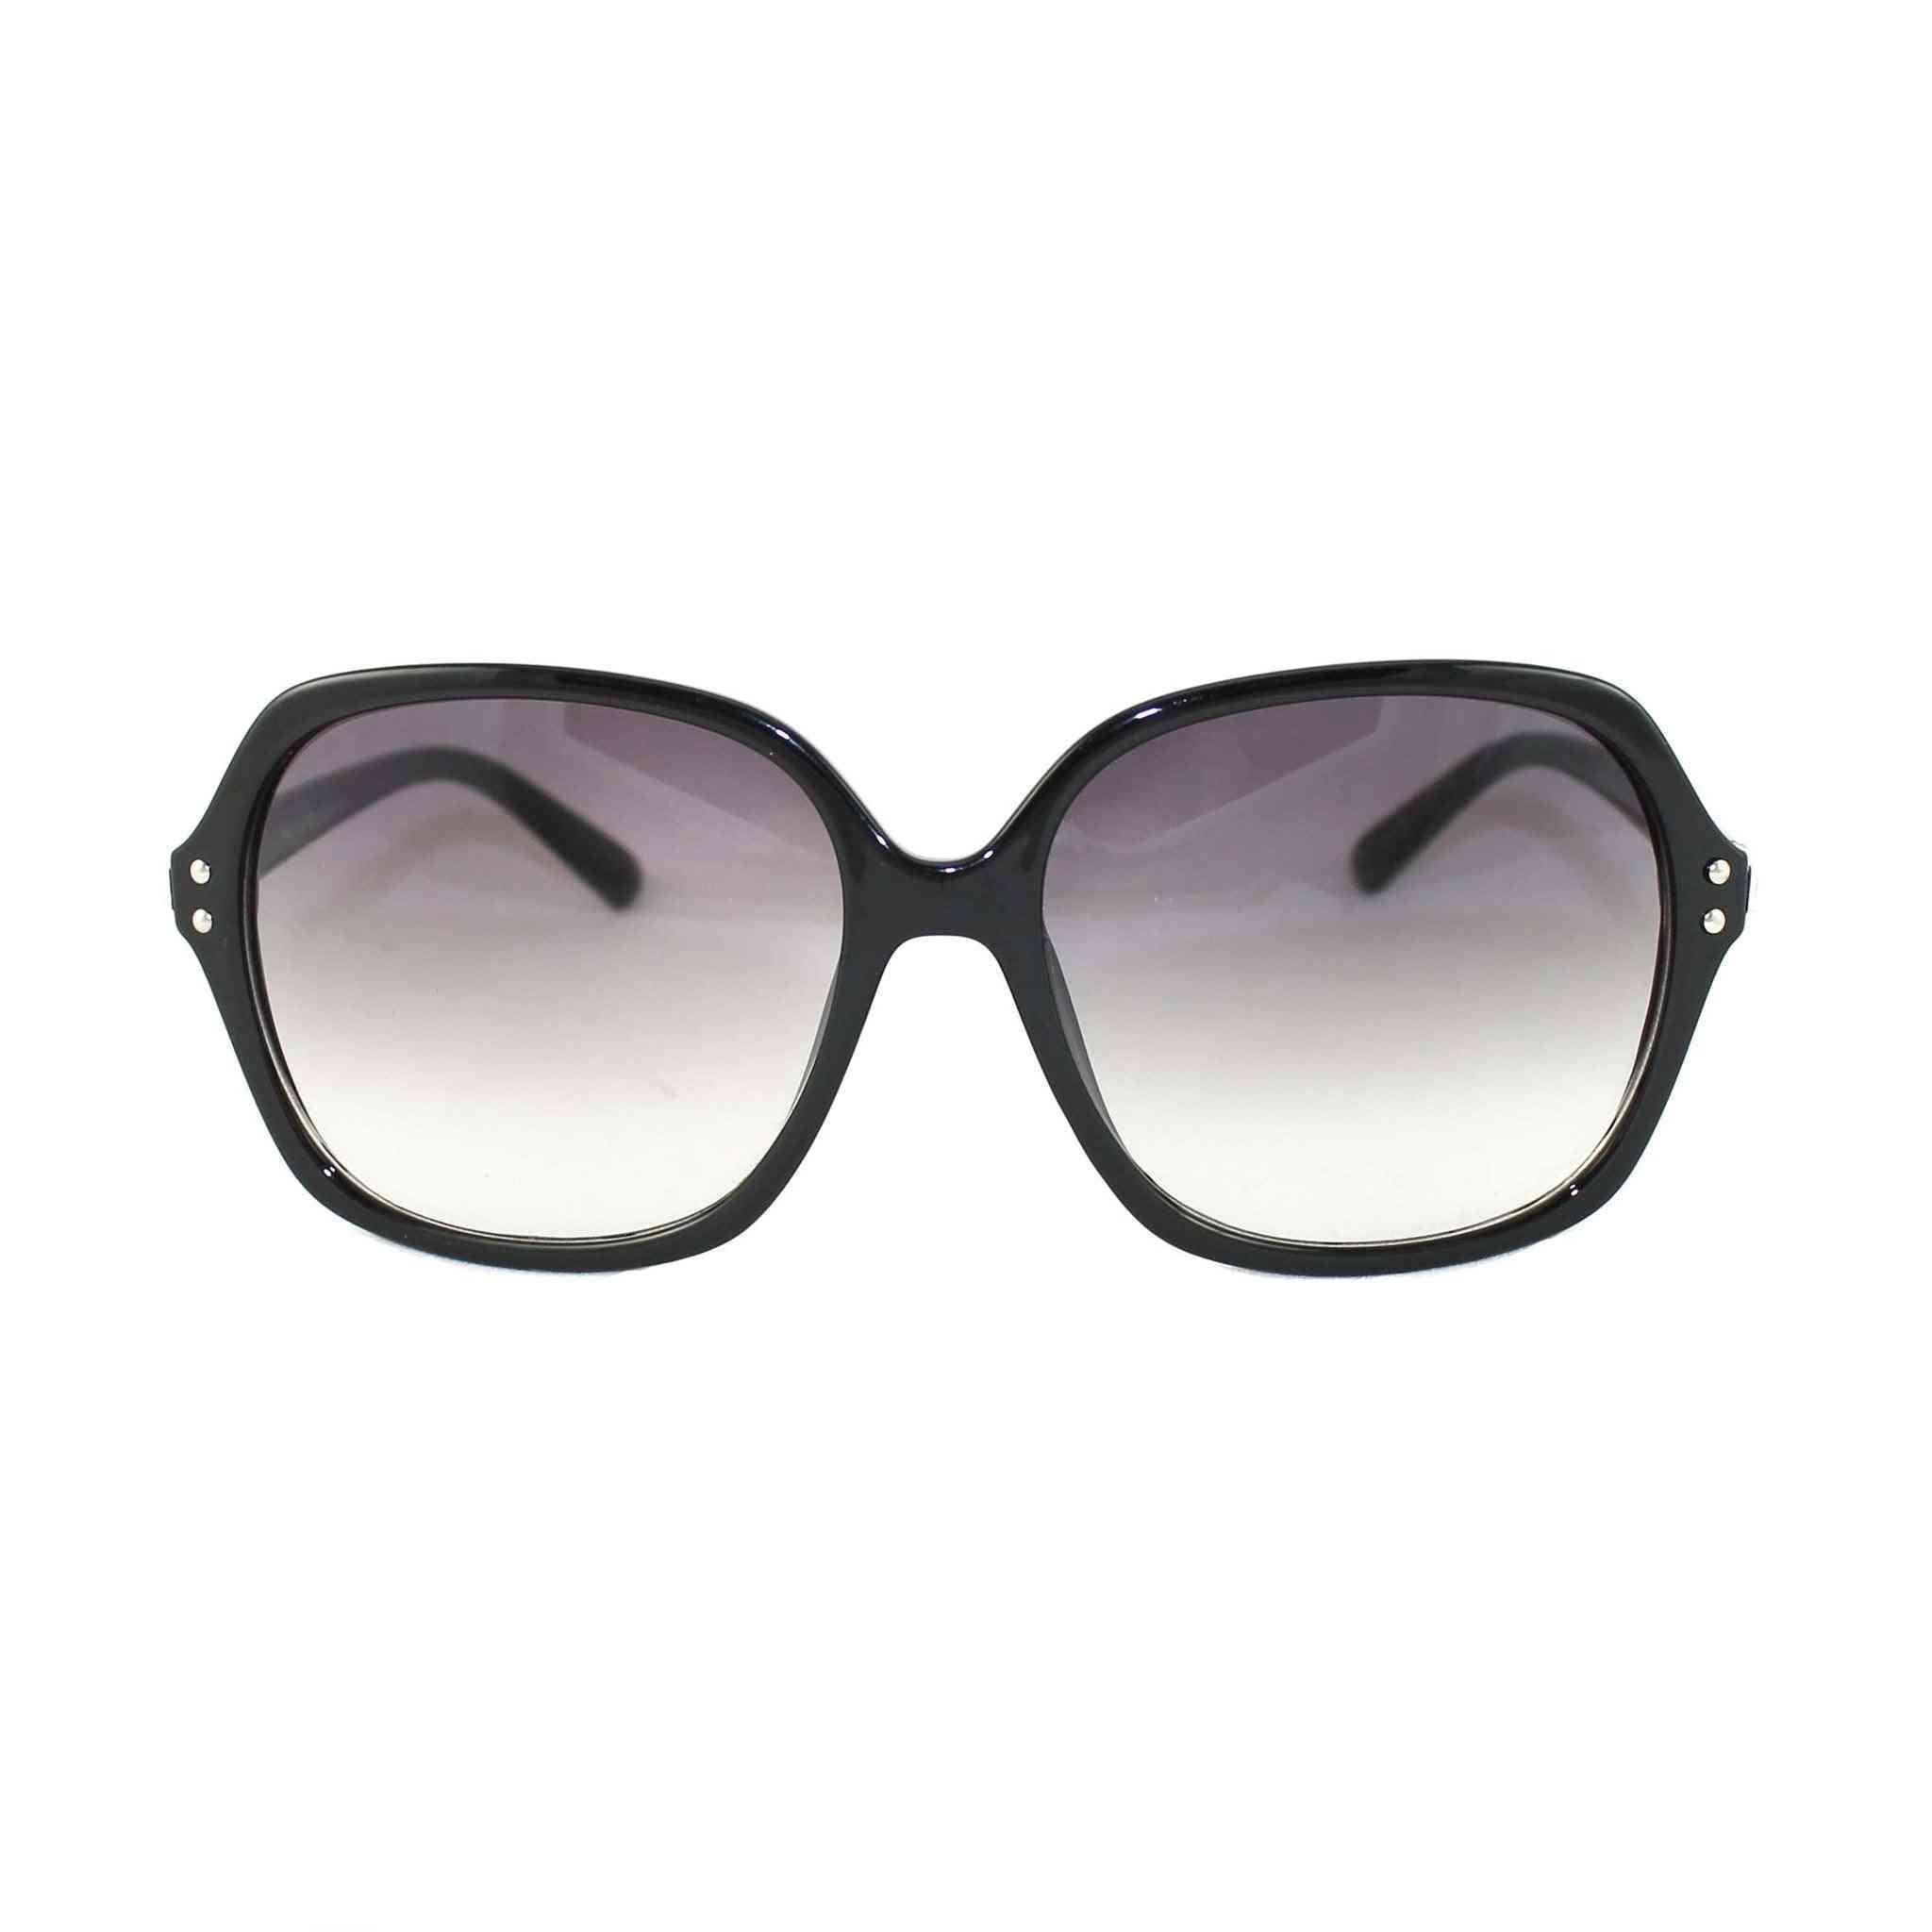 Vintage Style Large Frame Sunglasses